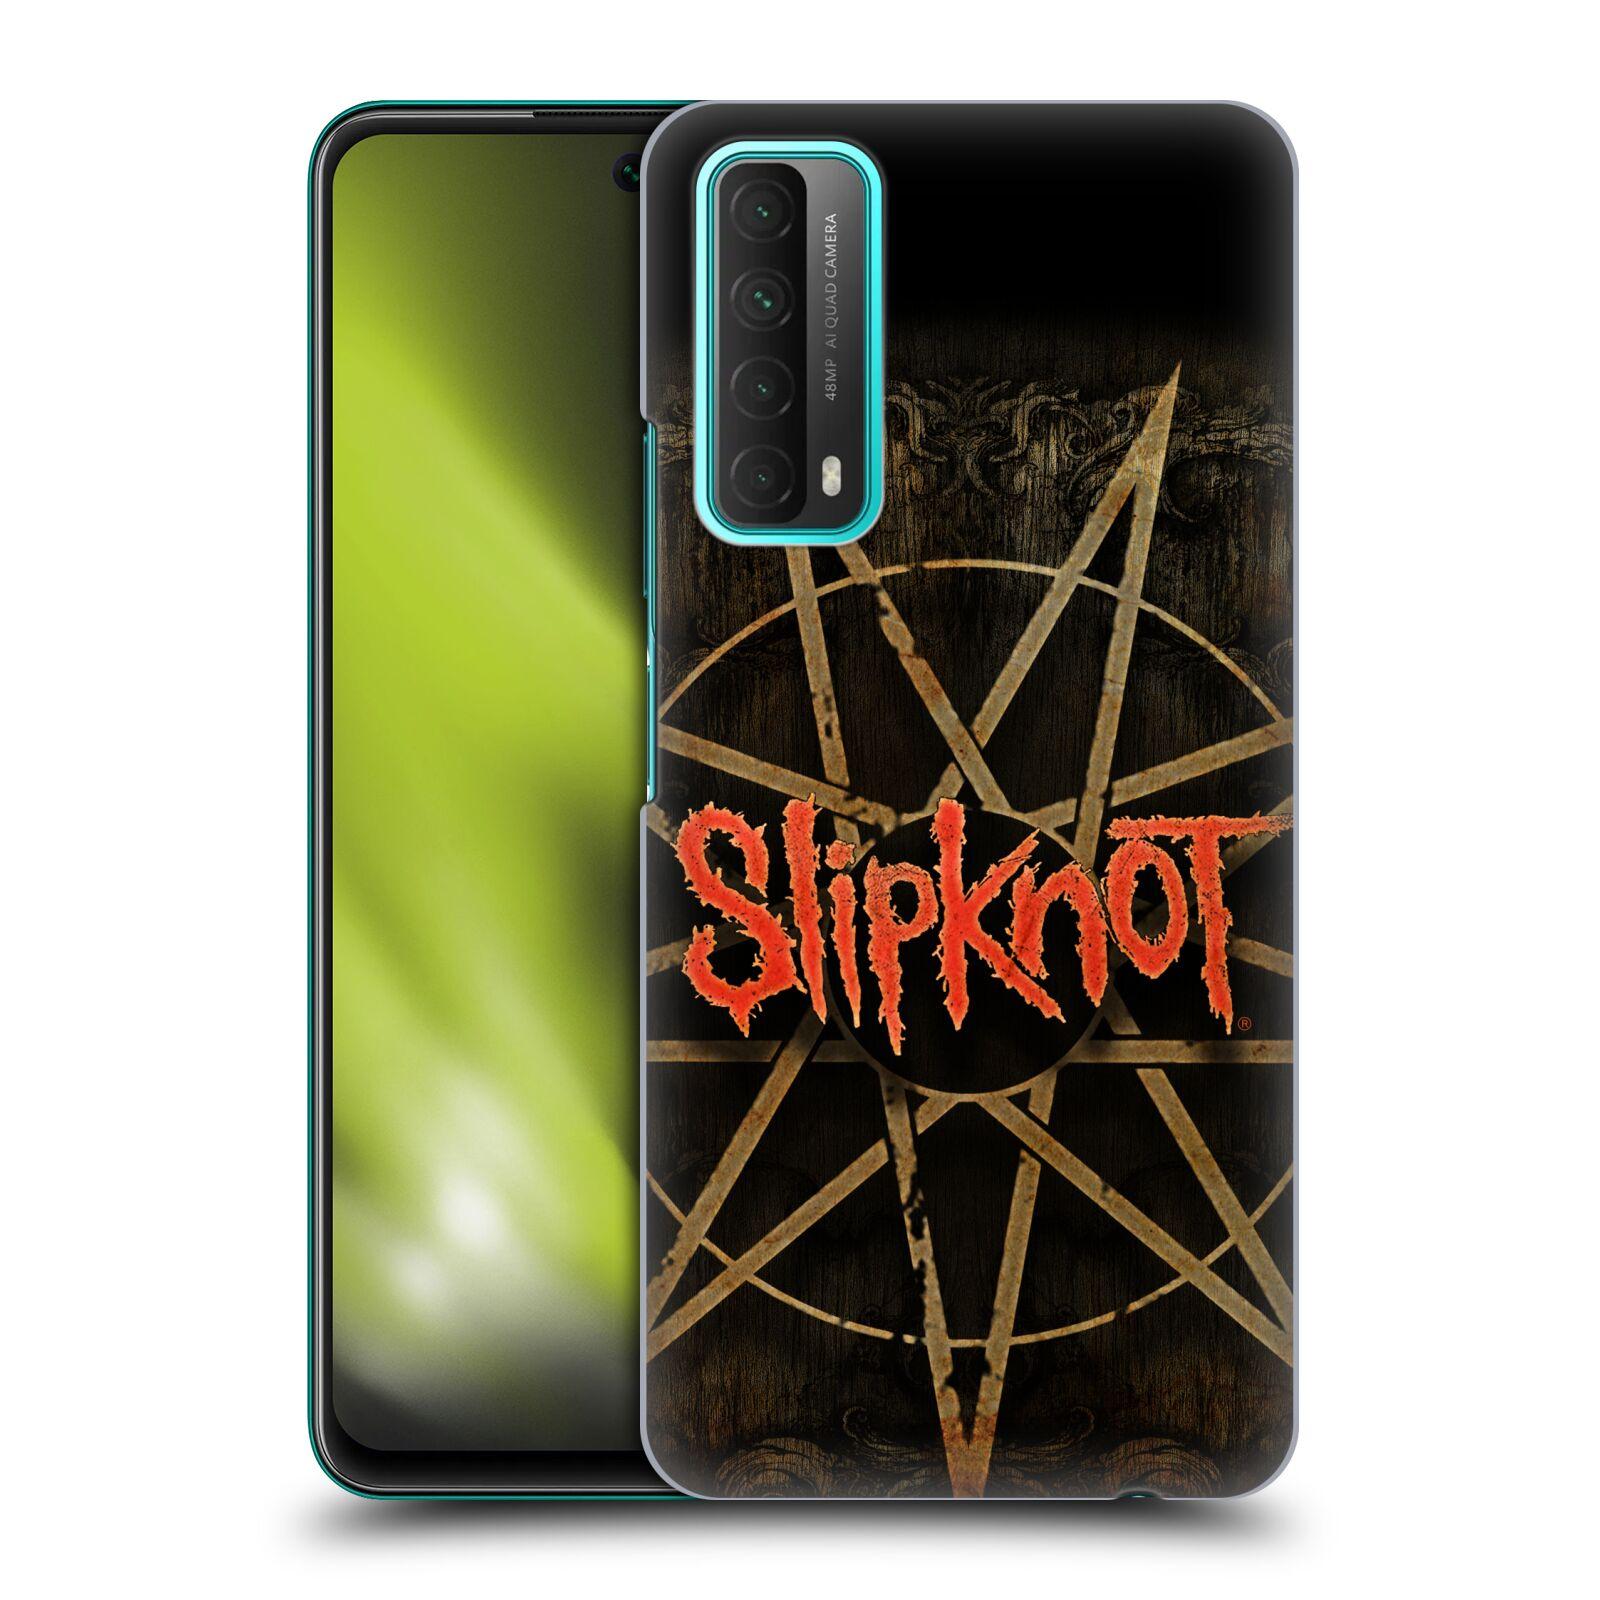 Plastové pouzdro na mobil Huawei P Smart (2021) - Head Case - Slipknot - Znak